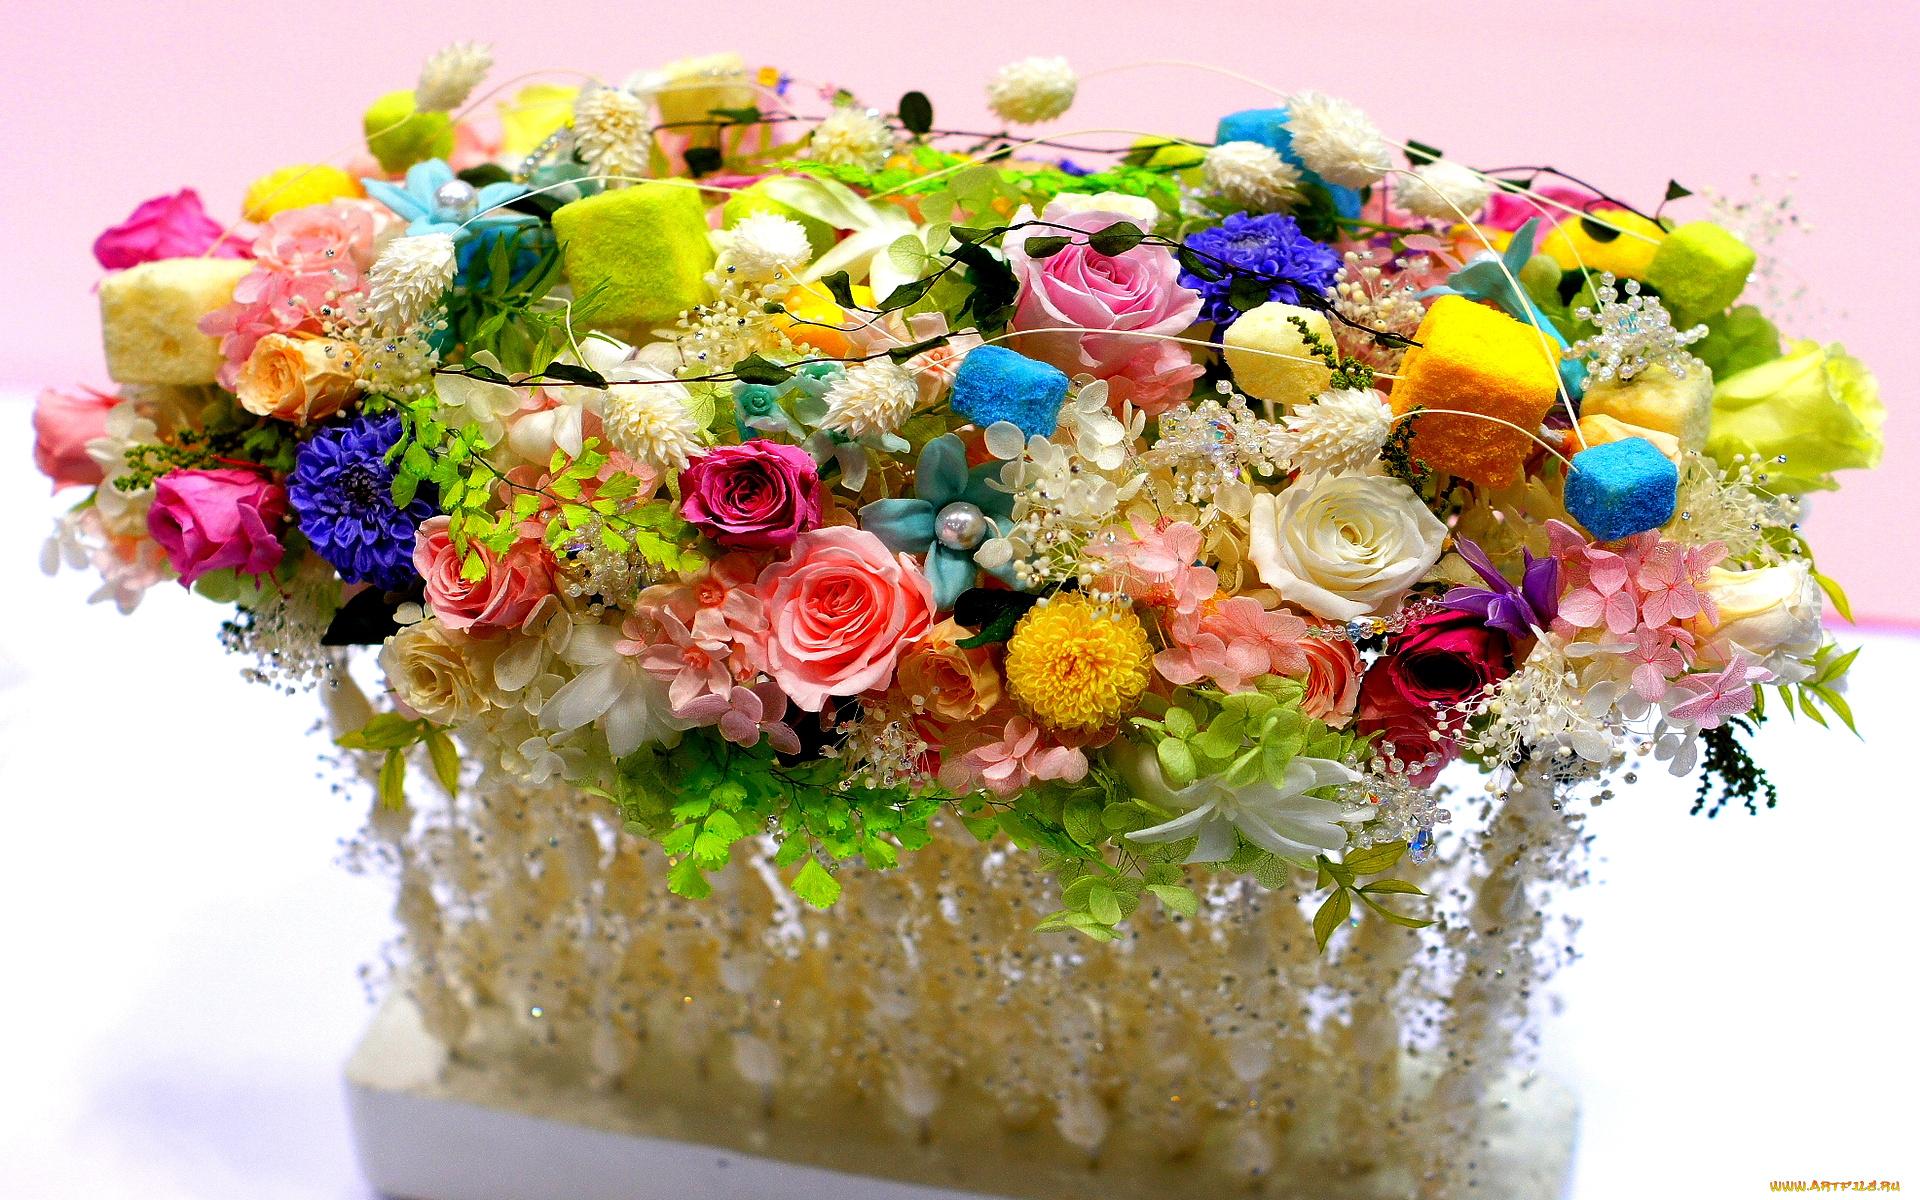 Креативная открытка с цветами, марта дочери